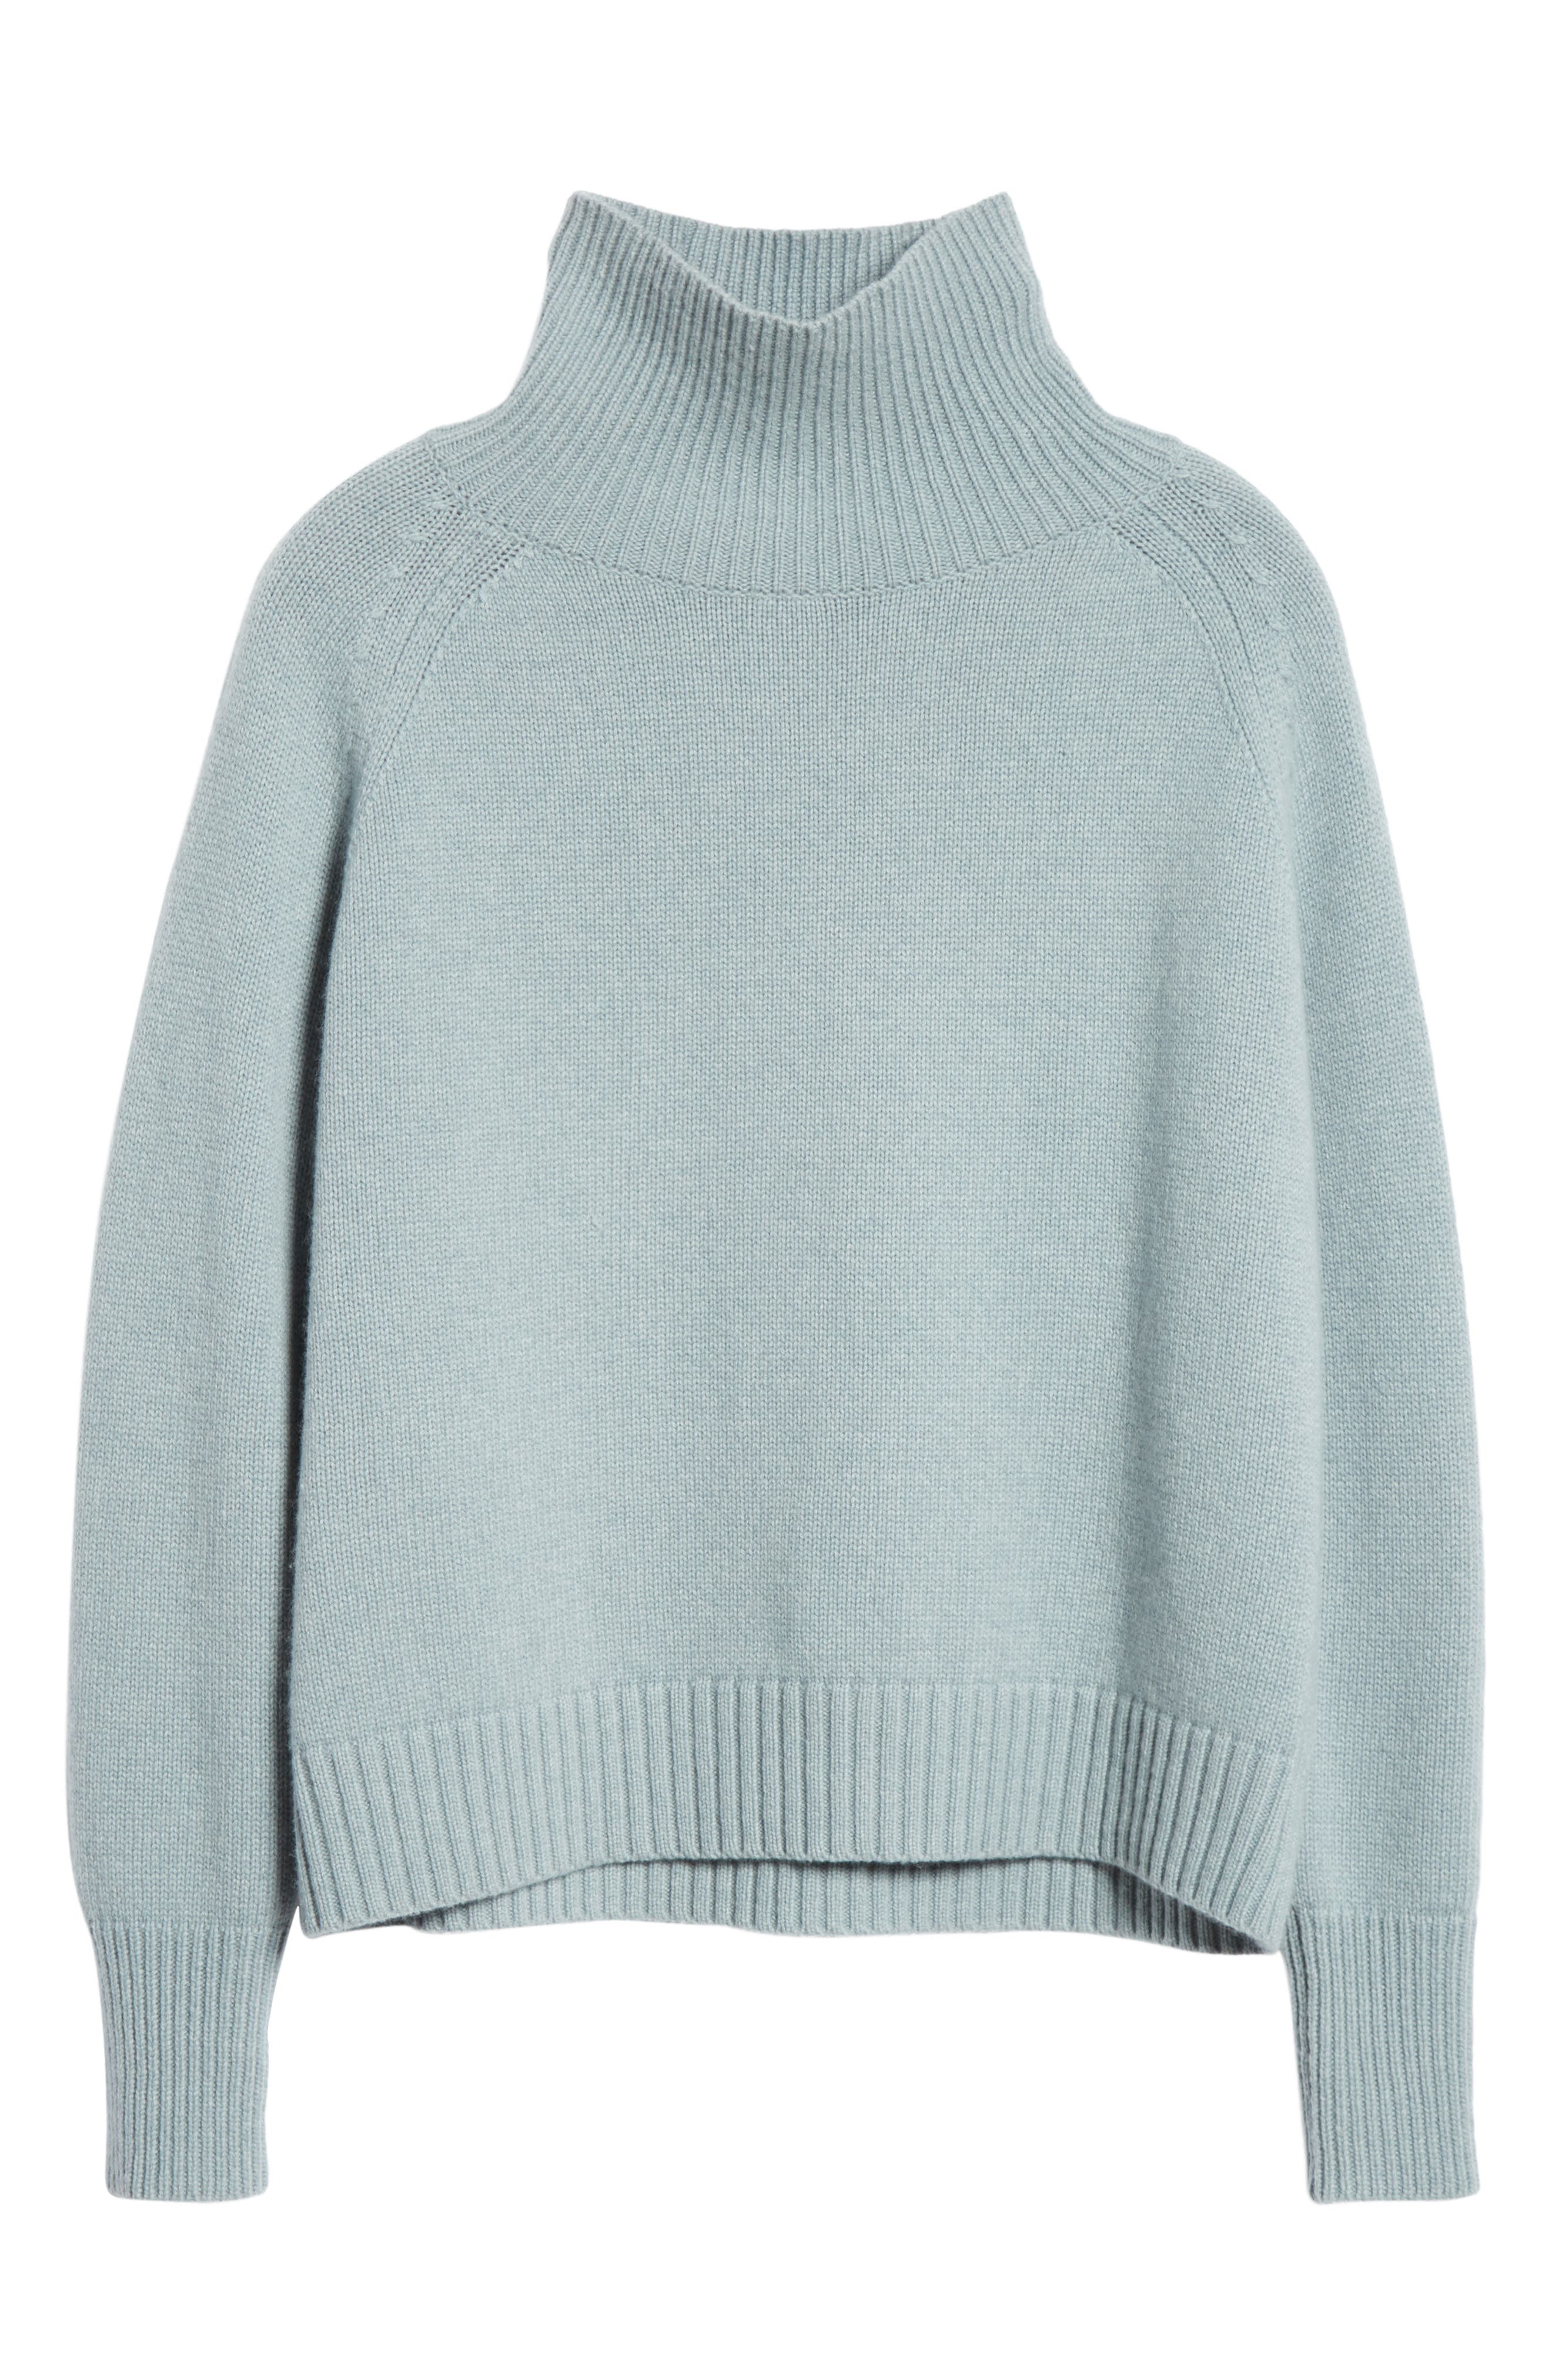 NILI LOTAN, Mariah Funnel Neck Cashmere Sweater, Alternate thumbnail 6, color, SKY BLUE